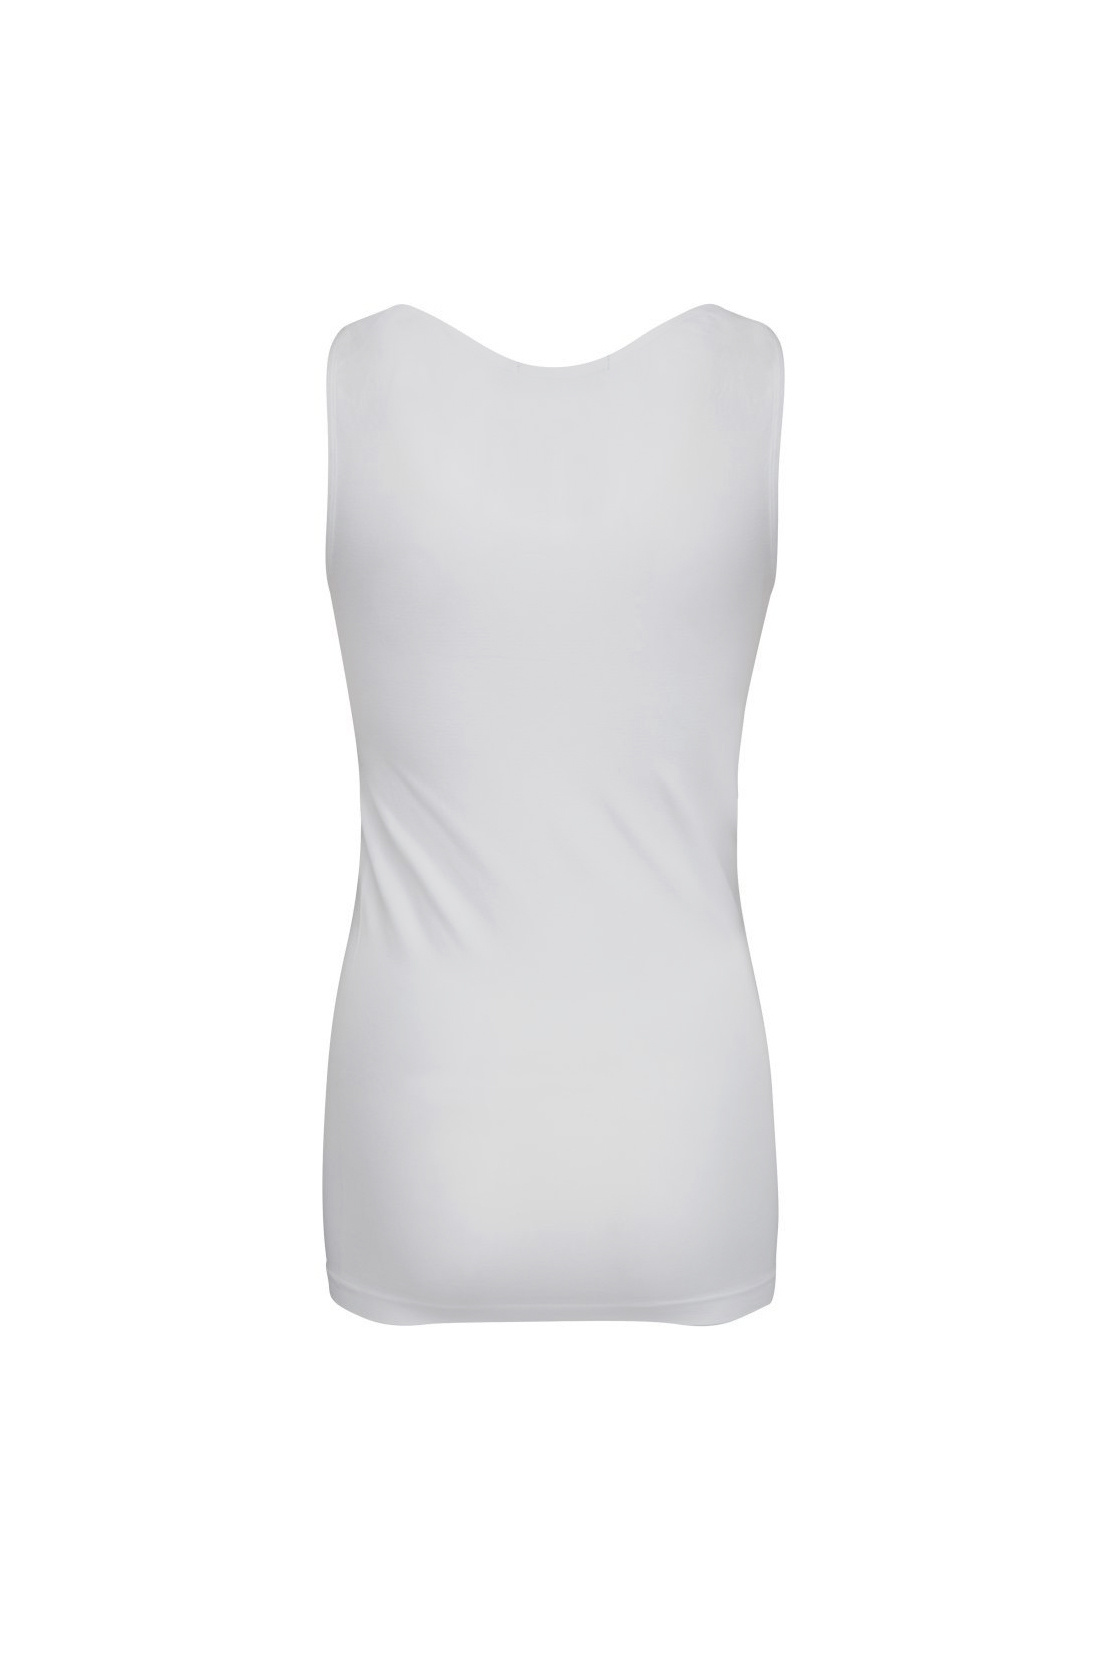 Clarice Top - White XL-2